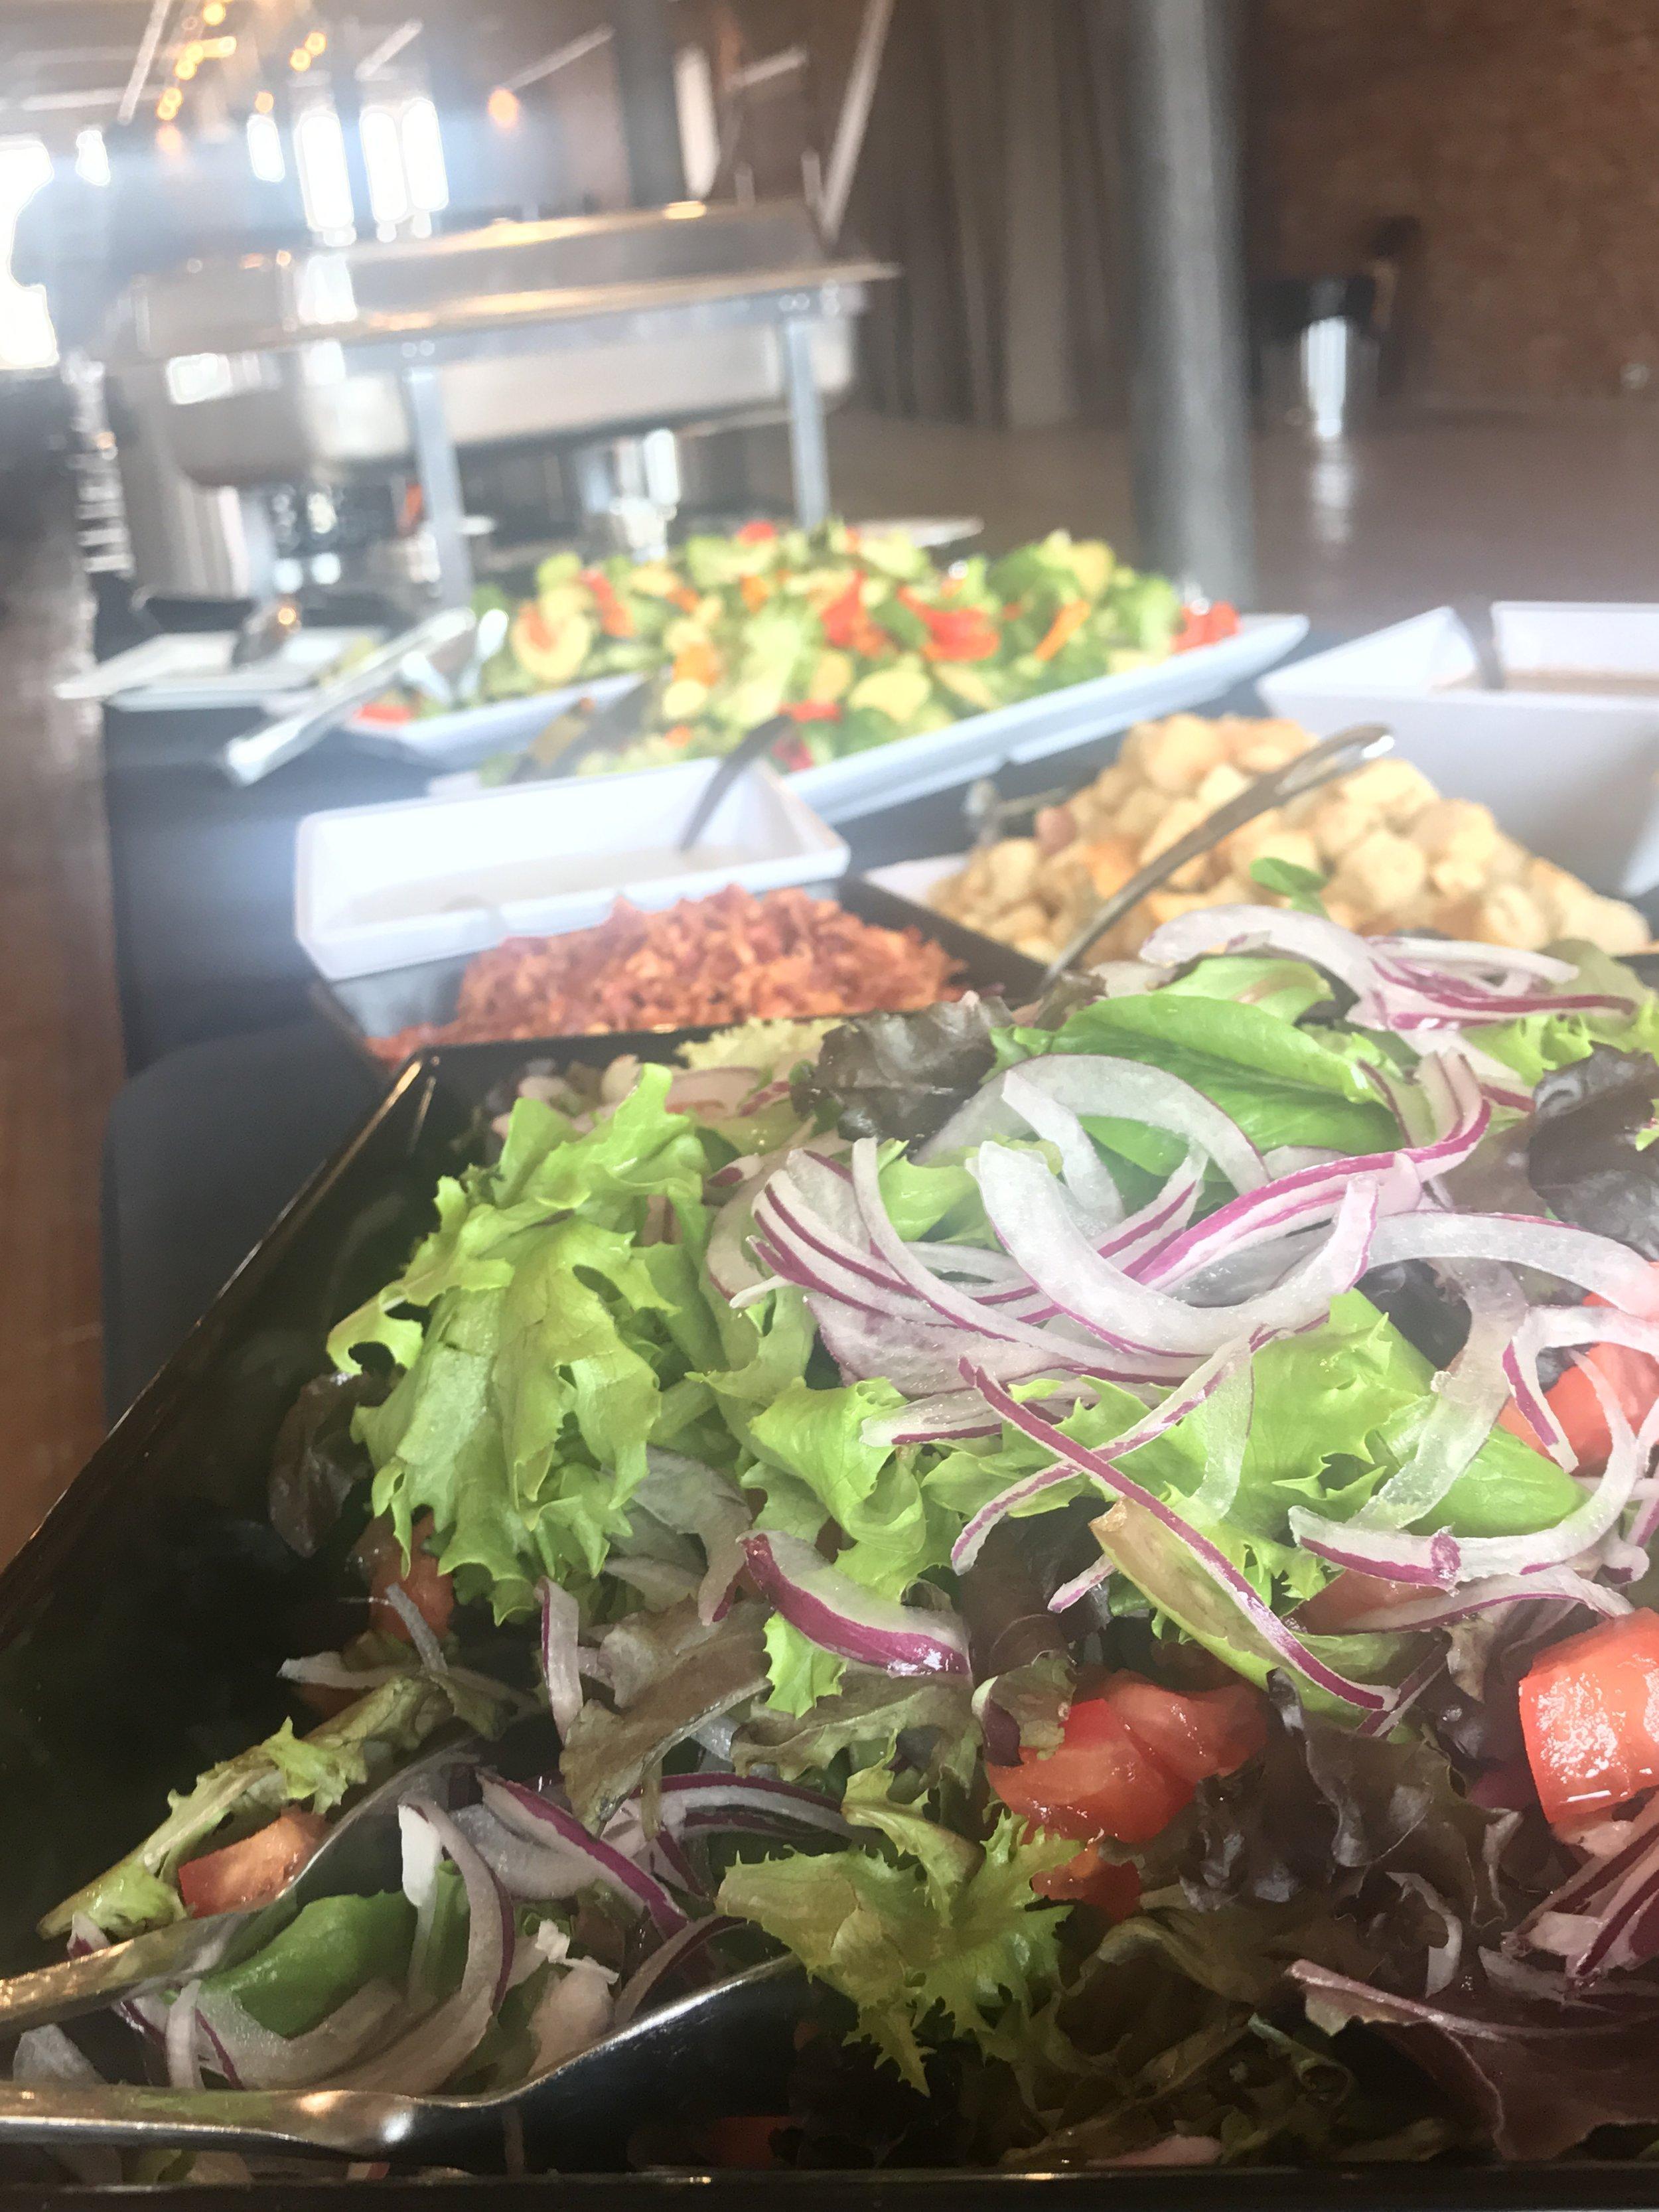 box-lunches-breakfast-buffett-appetizers-full-buffett-office-catering-lenexa-mission-hills-plaza-kcmo-organic112.jpg